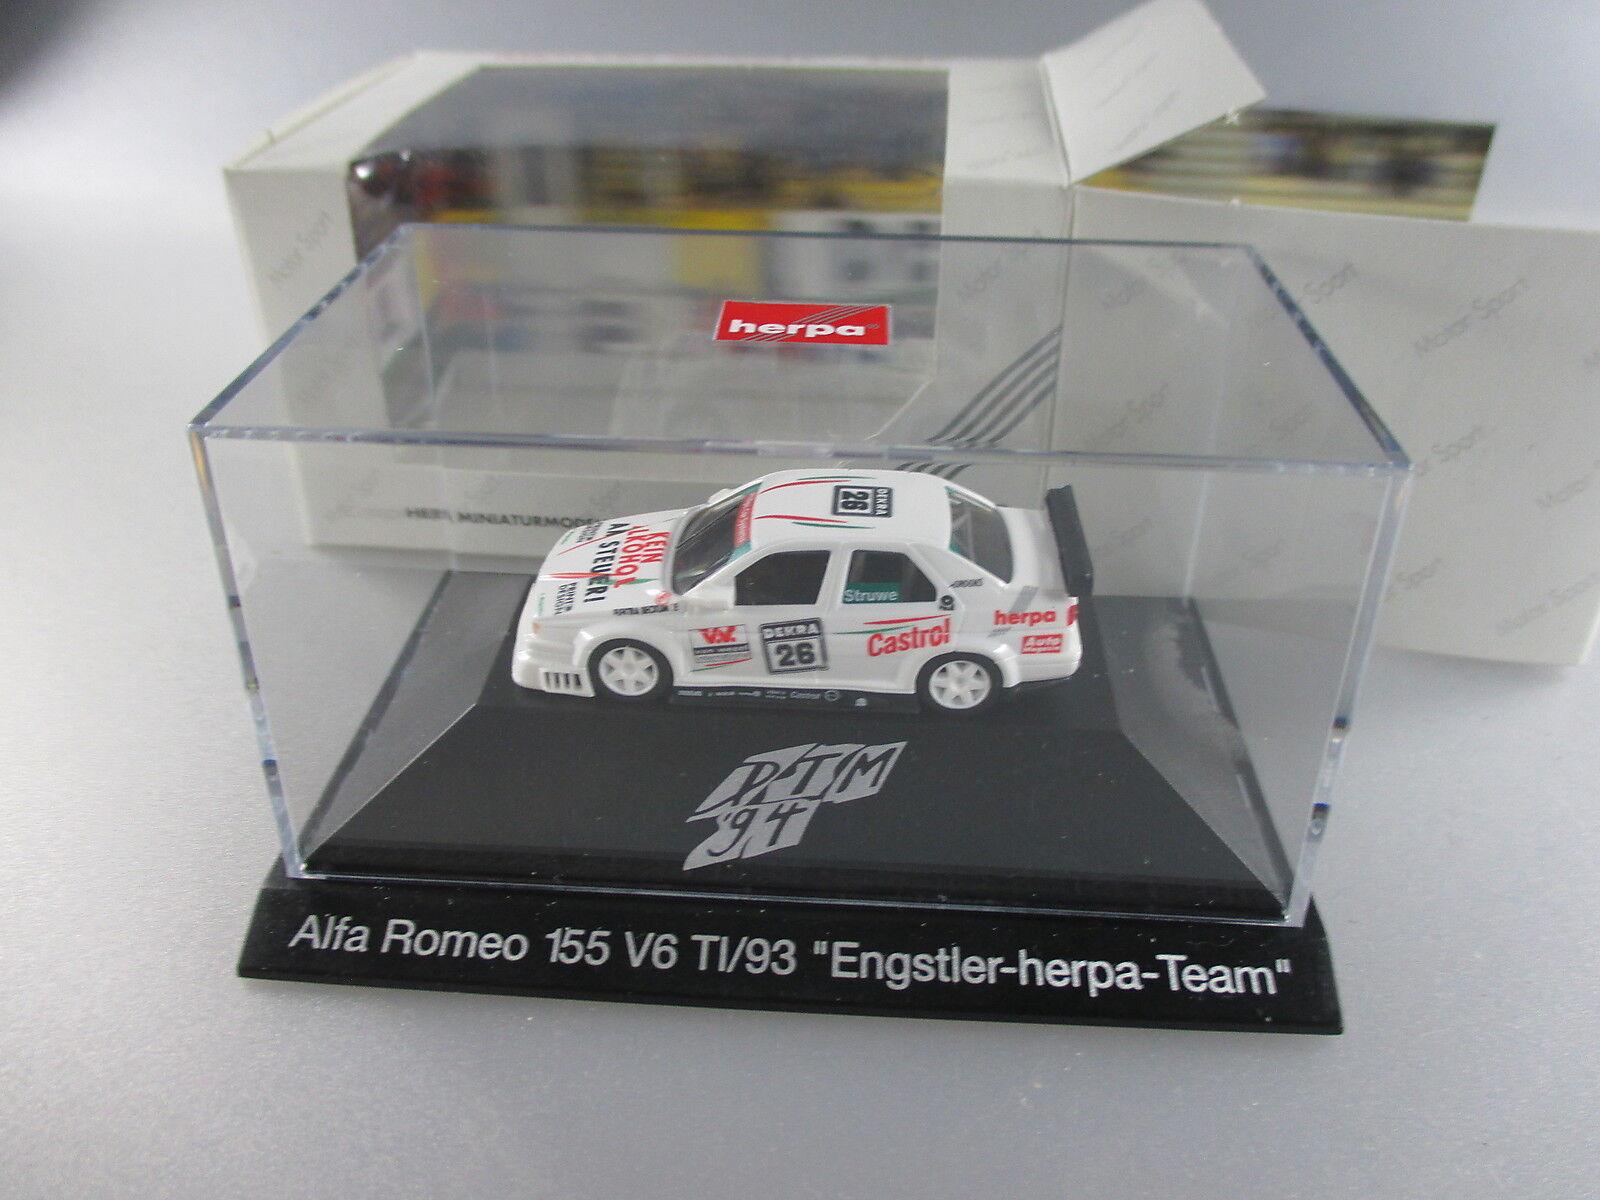 Herpa Herpa Herpa  motor sport nº 036061 dtm´94 Alfa Romeo 155 v6 t1 engstler Herpa (gk9)  más descuento